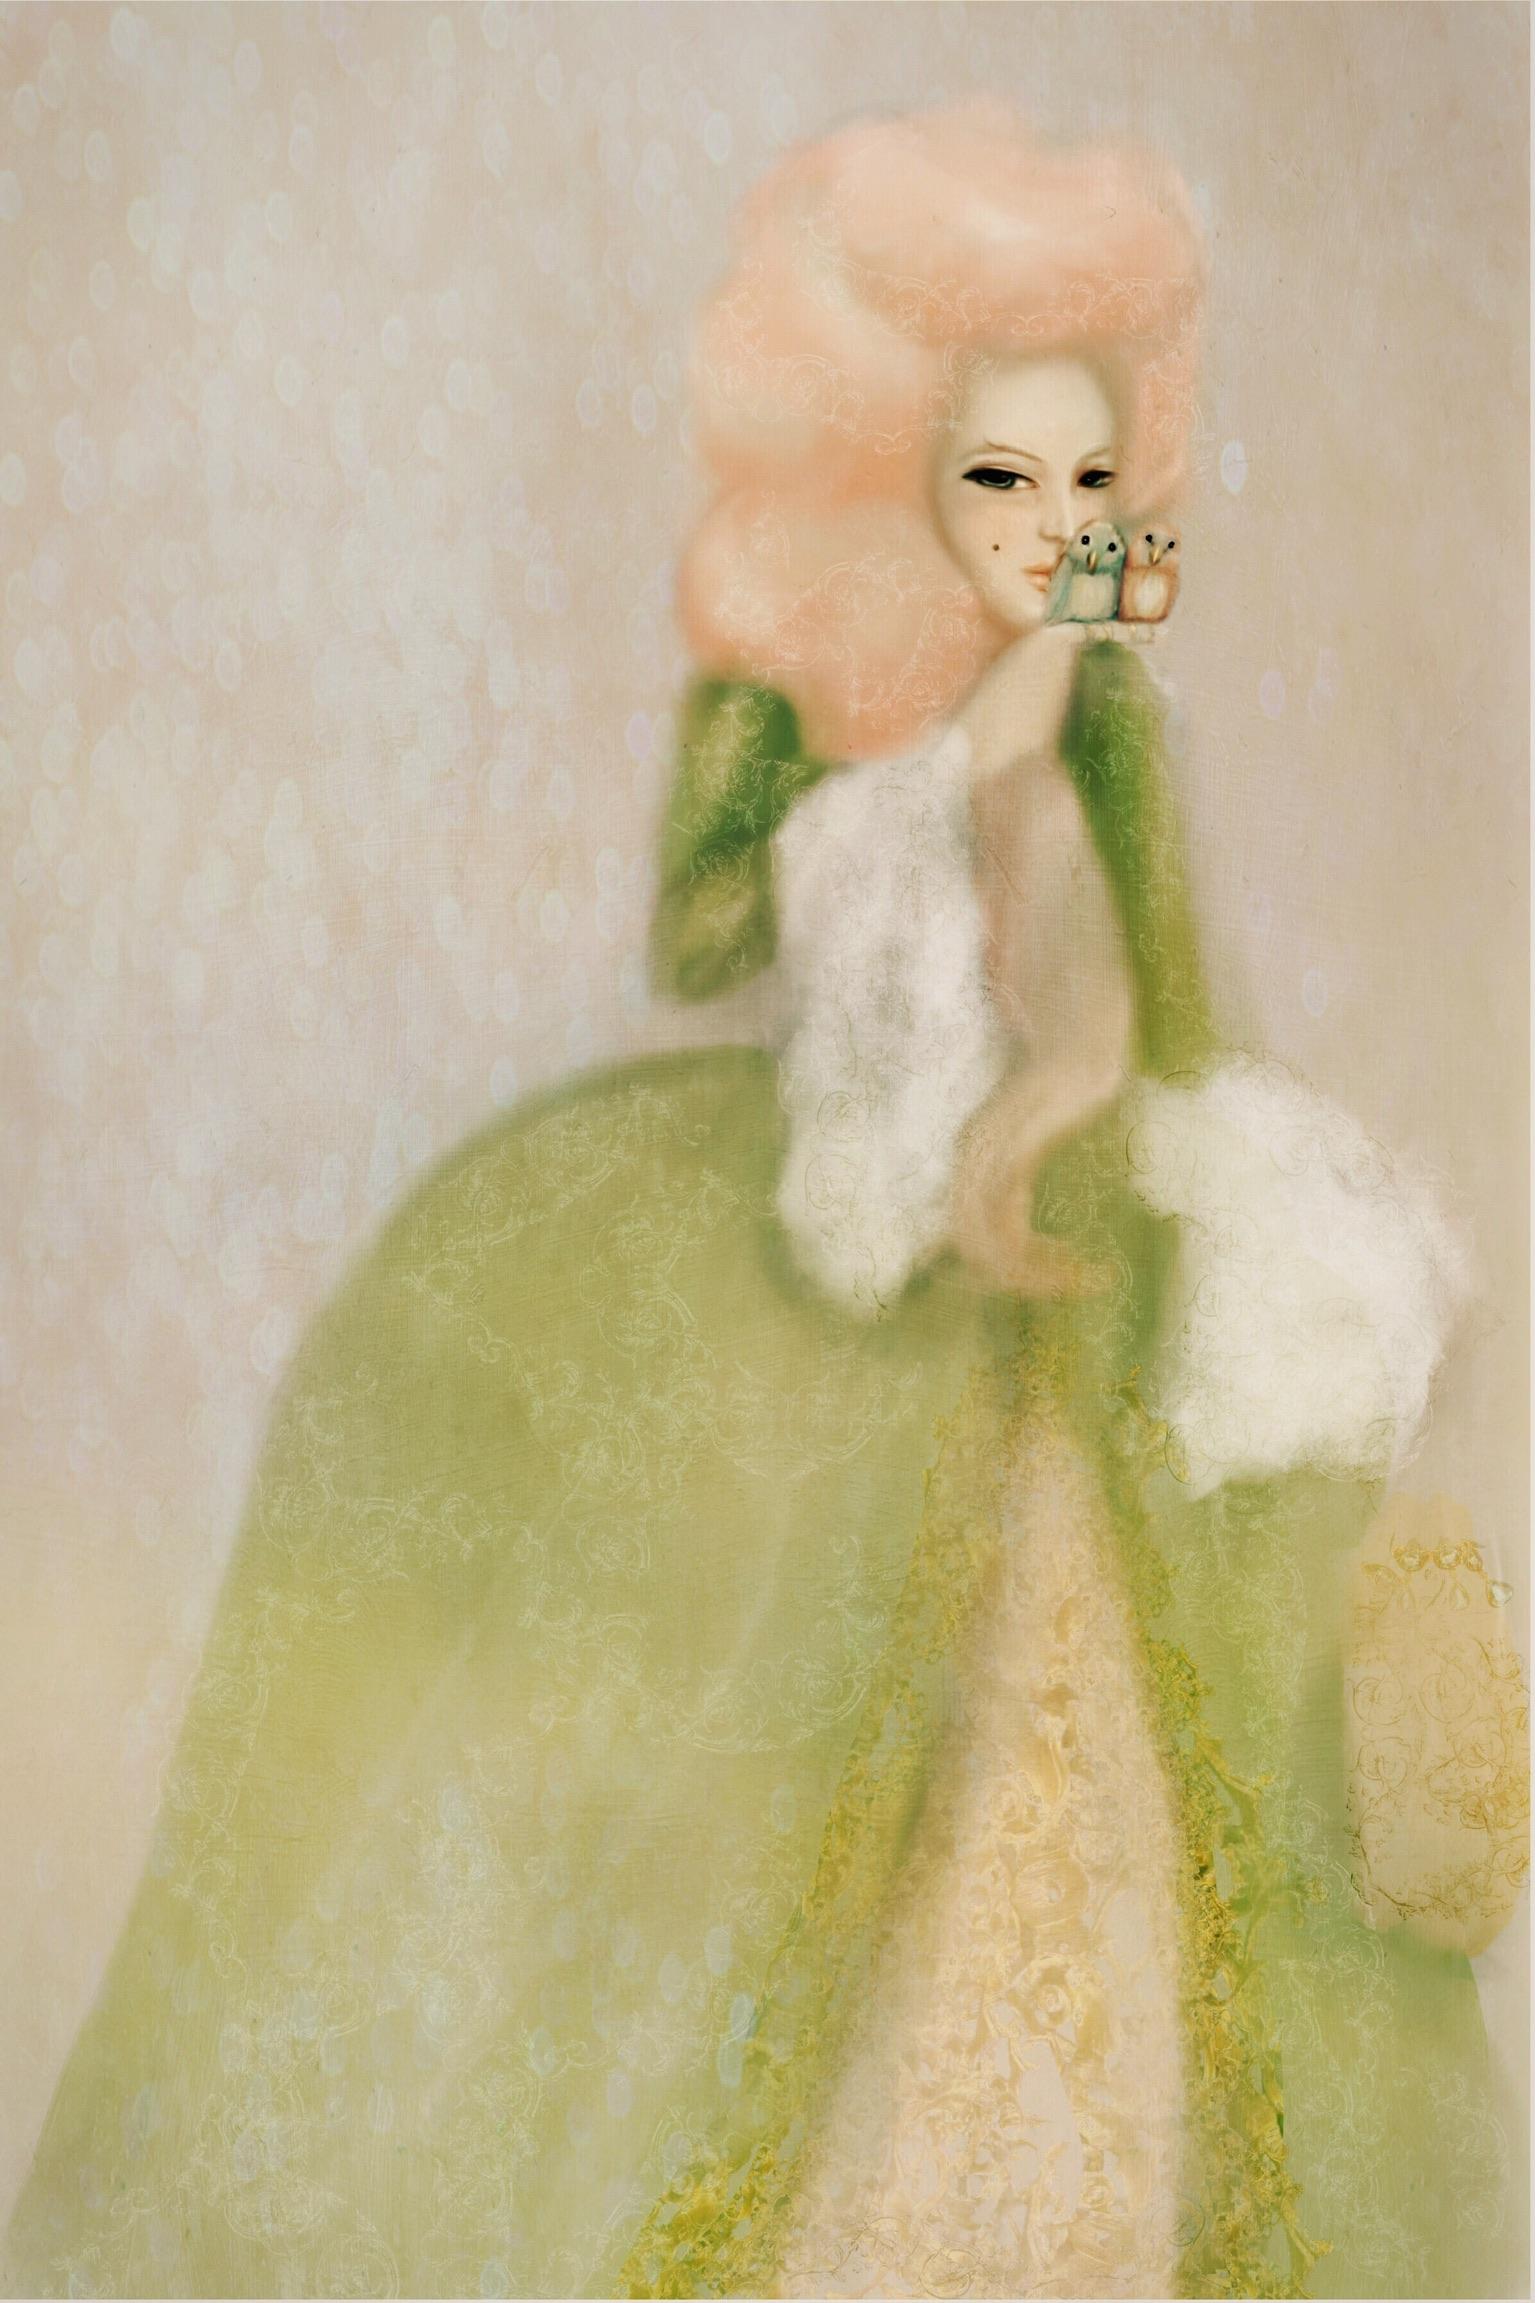 marie-antoinette-pink-hair-with-bird-illustration.jpg